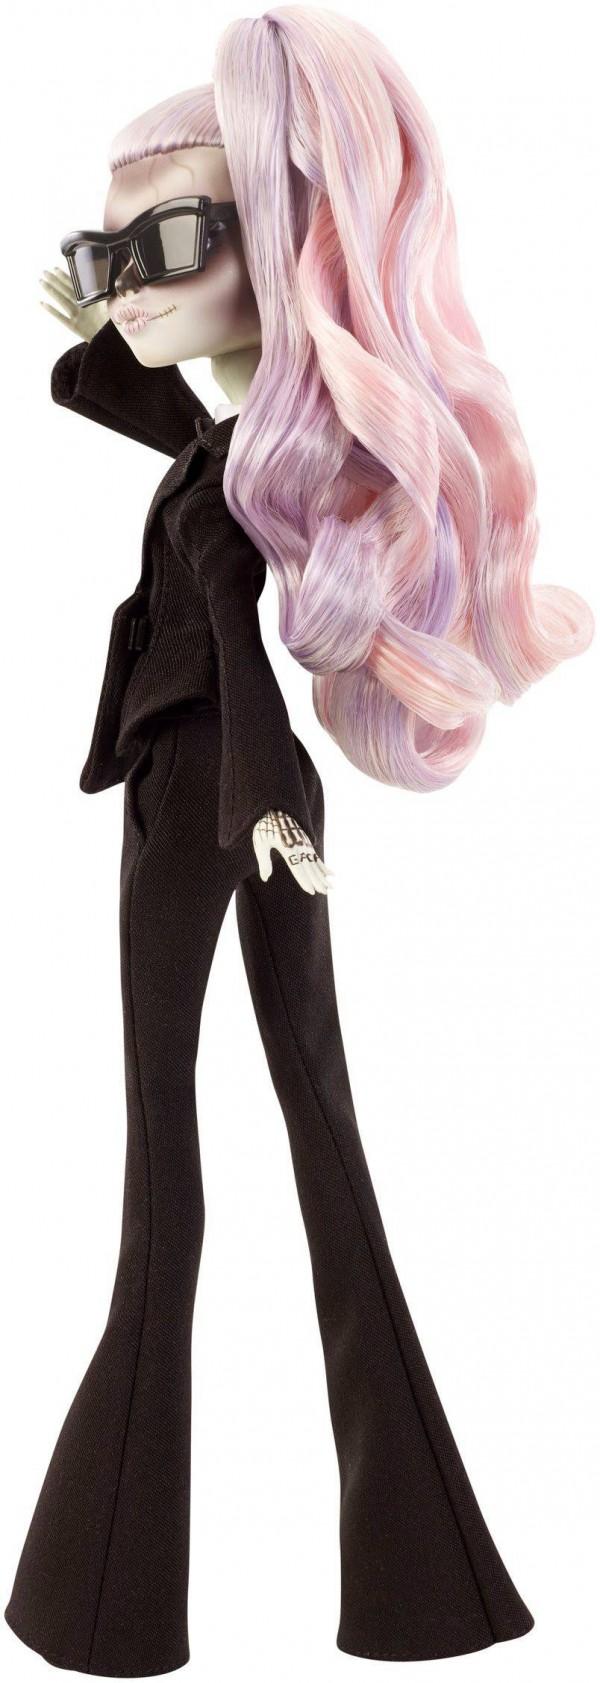 Zomby Gaga (Lady Gaga-Inspired Born This Way Foundation Doll)